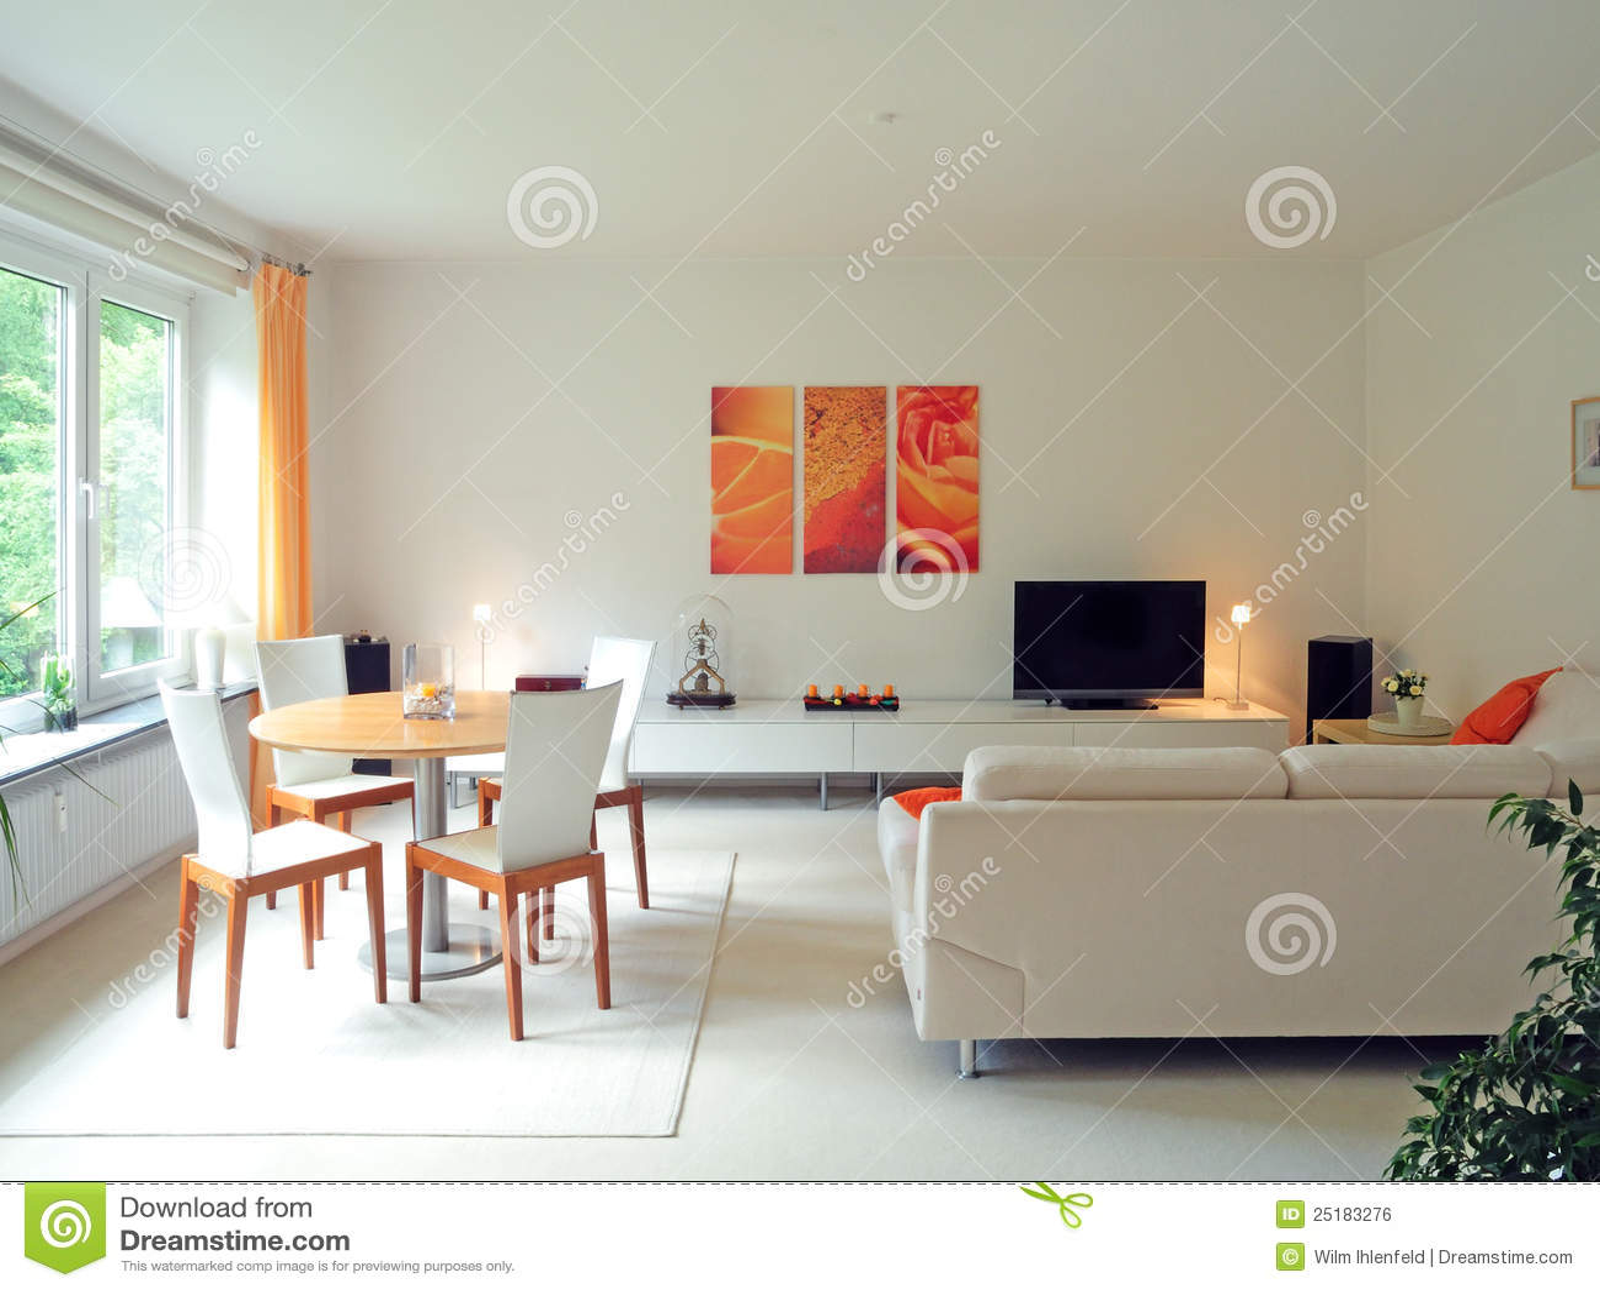 Moderne woonkamer royalty vrije stock afbeelding afbeelding 25183276 - Eigentijdse woonkamers ...